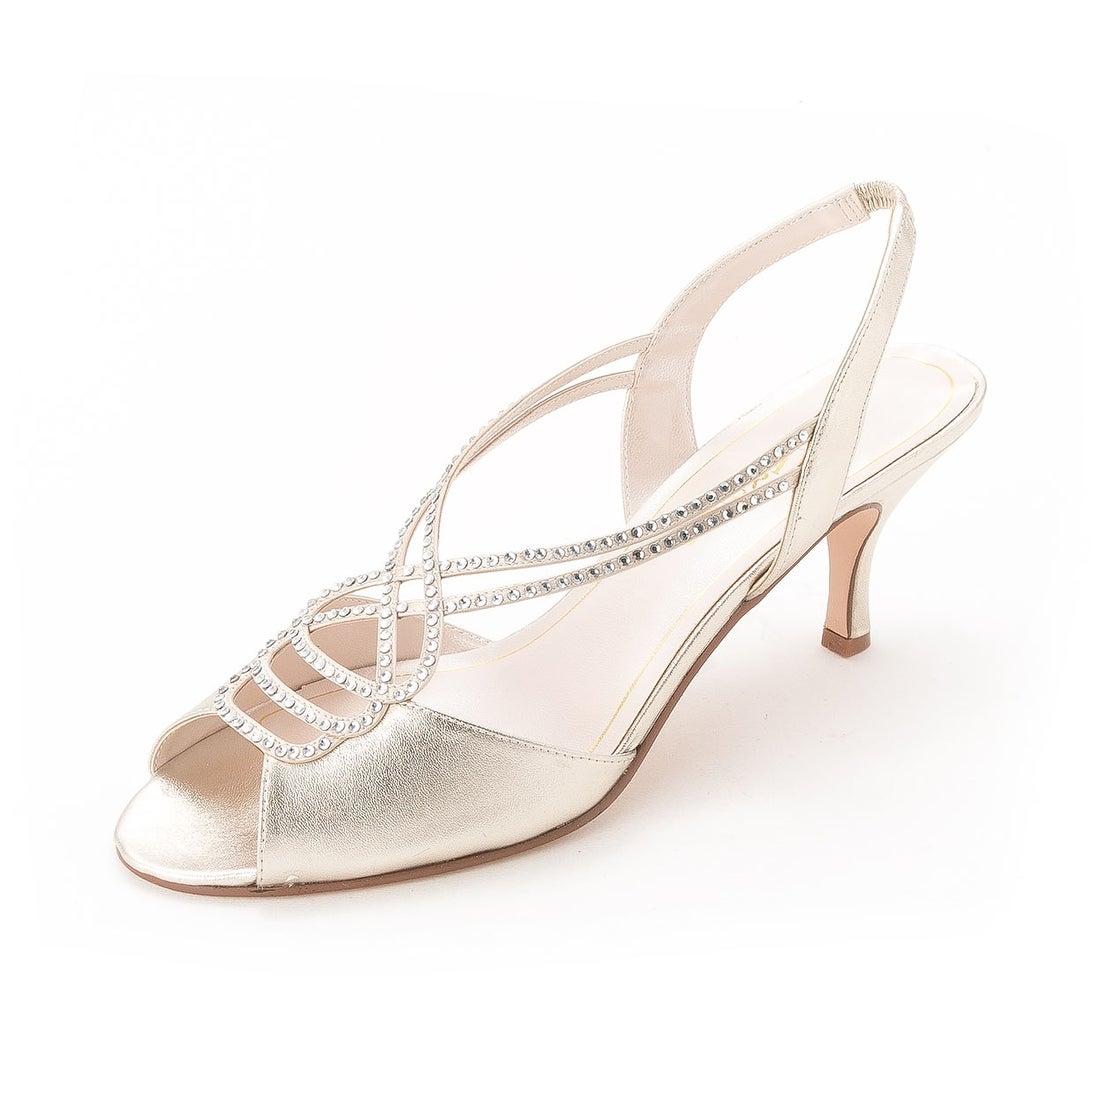 Caparros Womens MARISSA GLITTER Peep Toe Classic Pumps Nude Glitter Size 6.0